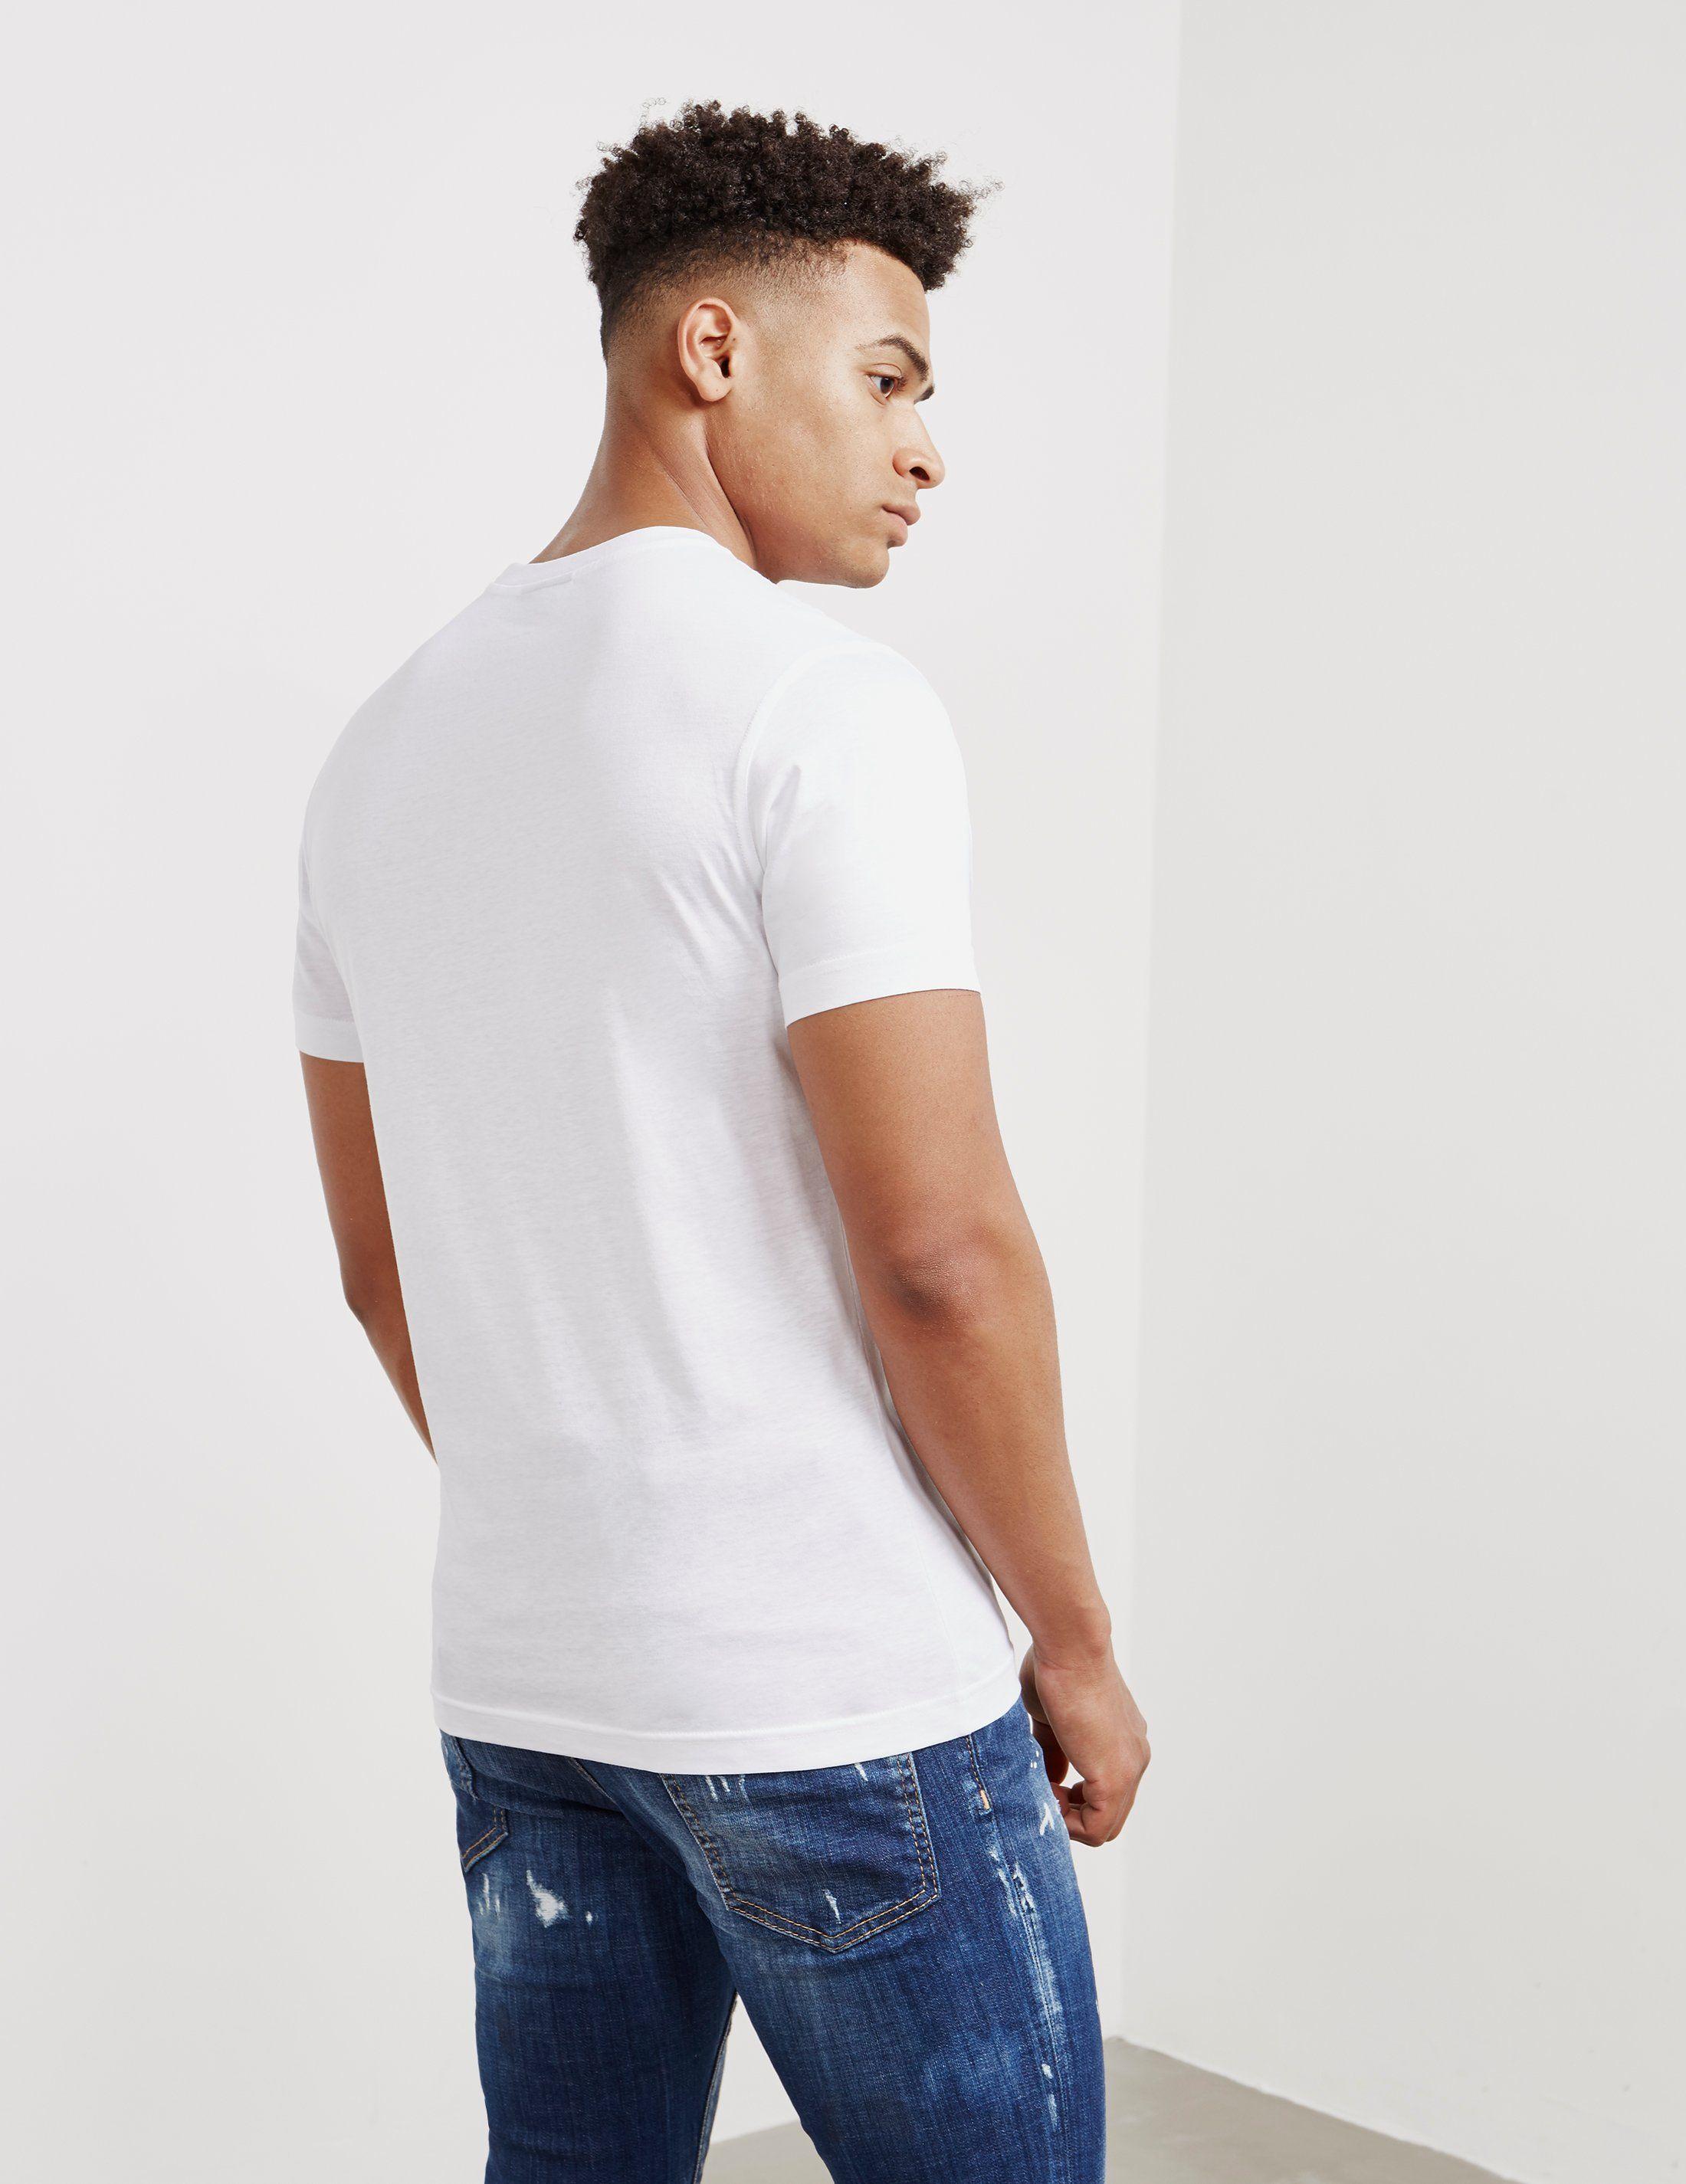 Dimoral Octopus Short Sleeve T-Shirt